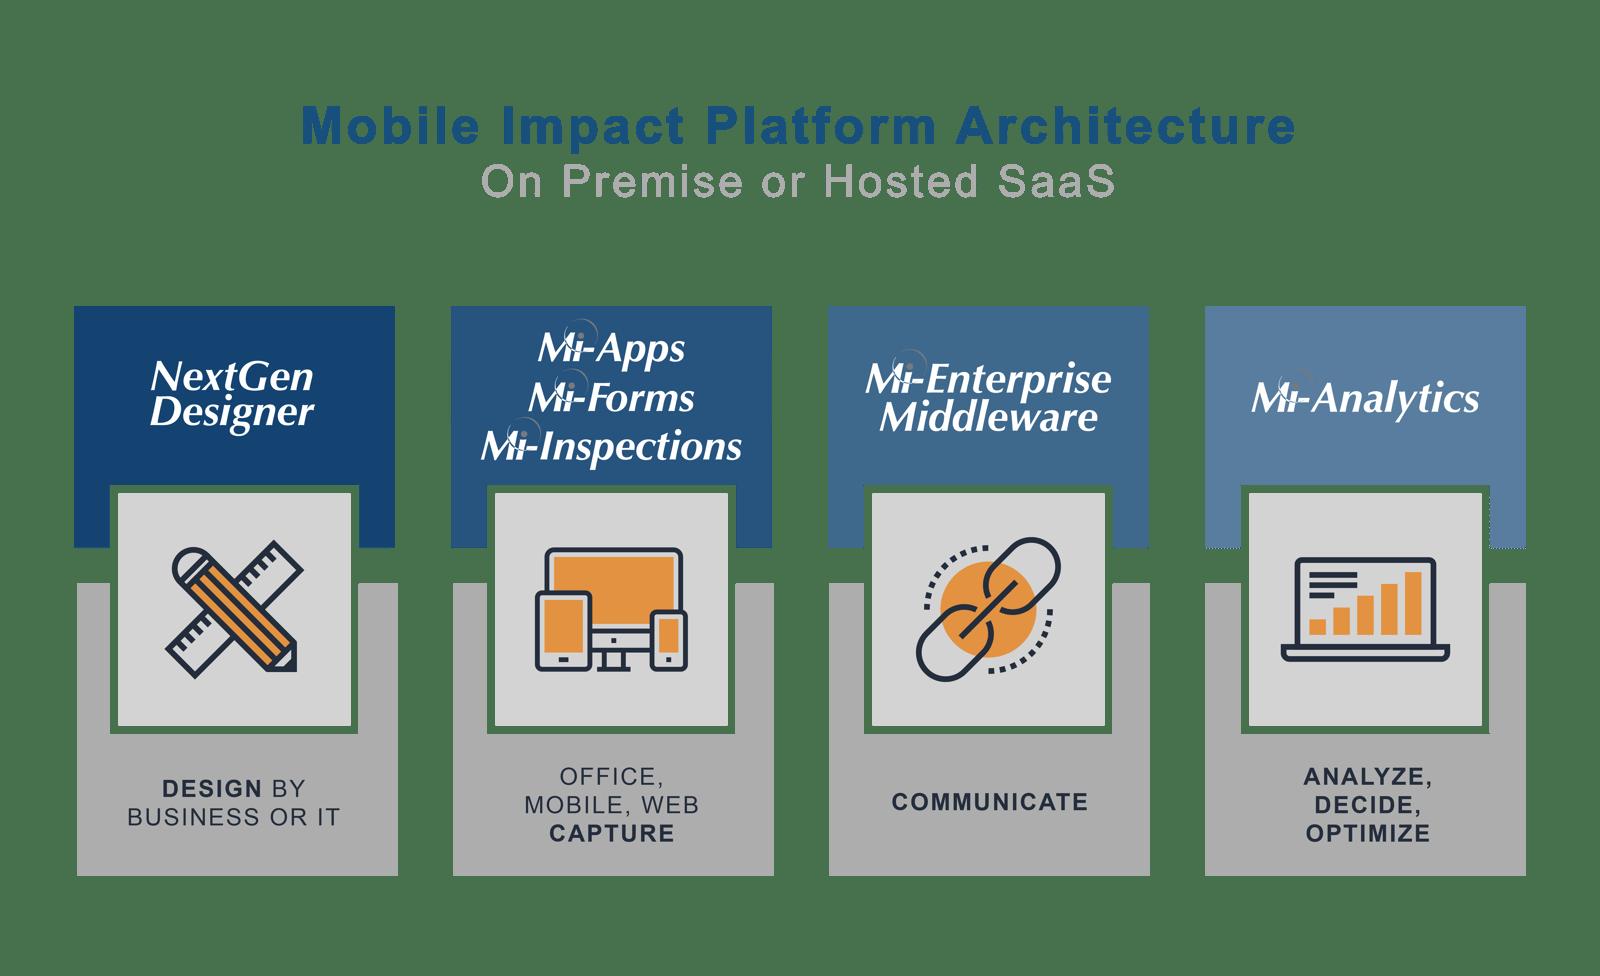 Mobile Impact Platform Architecture